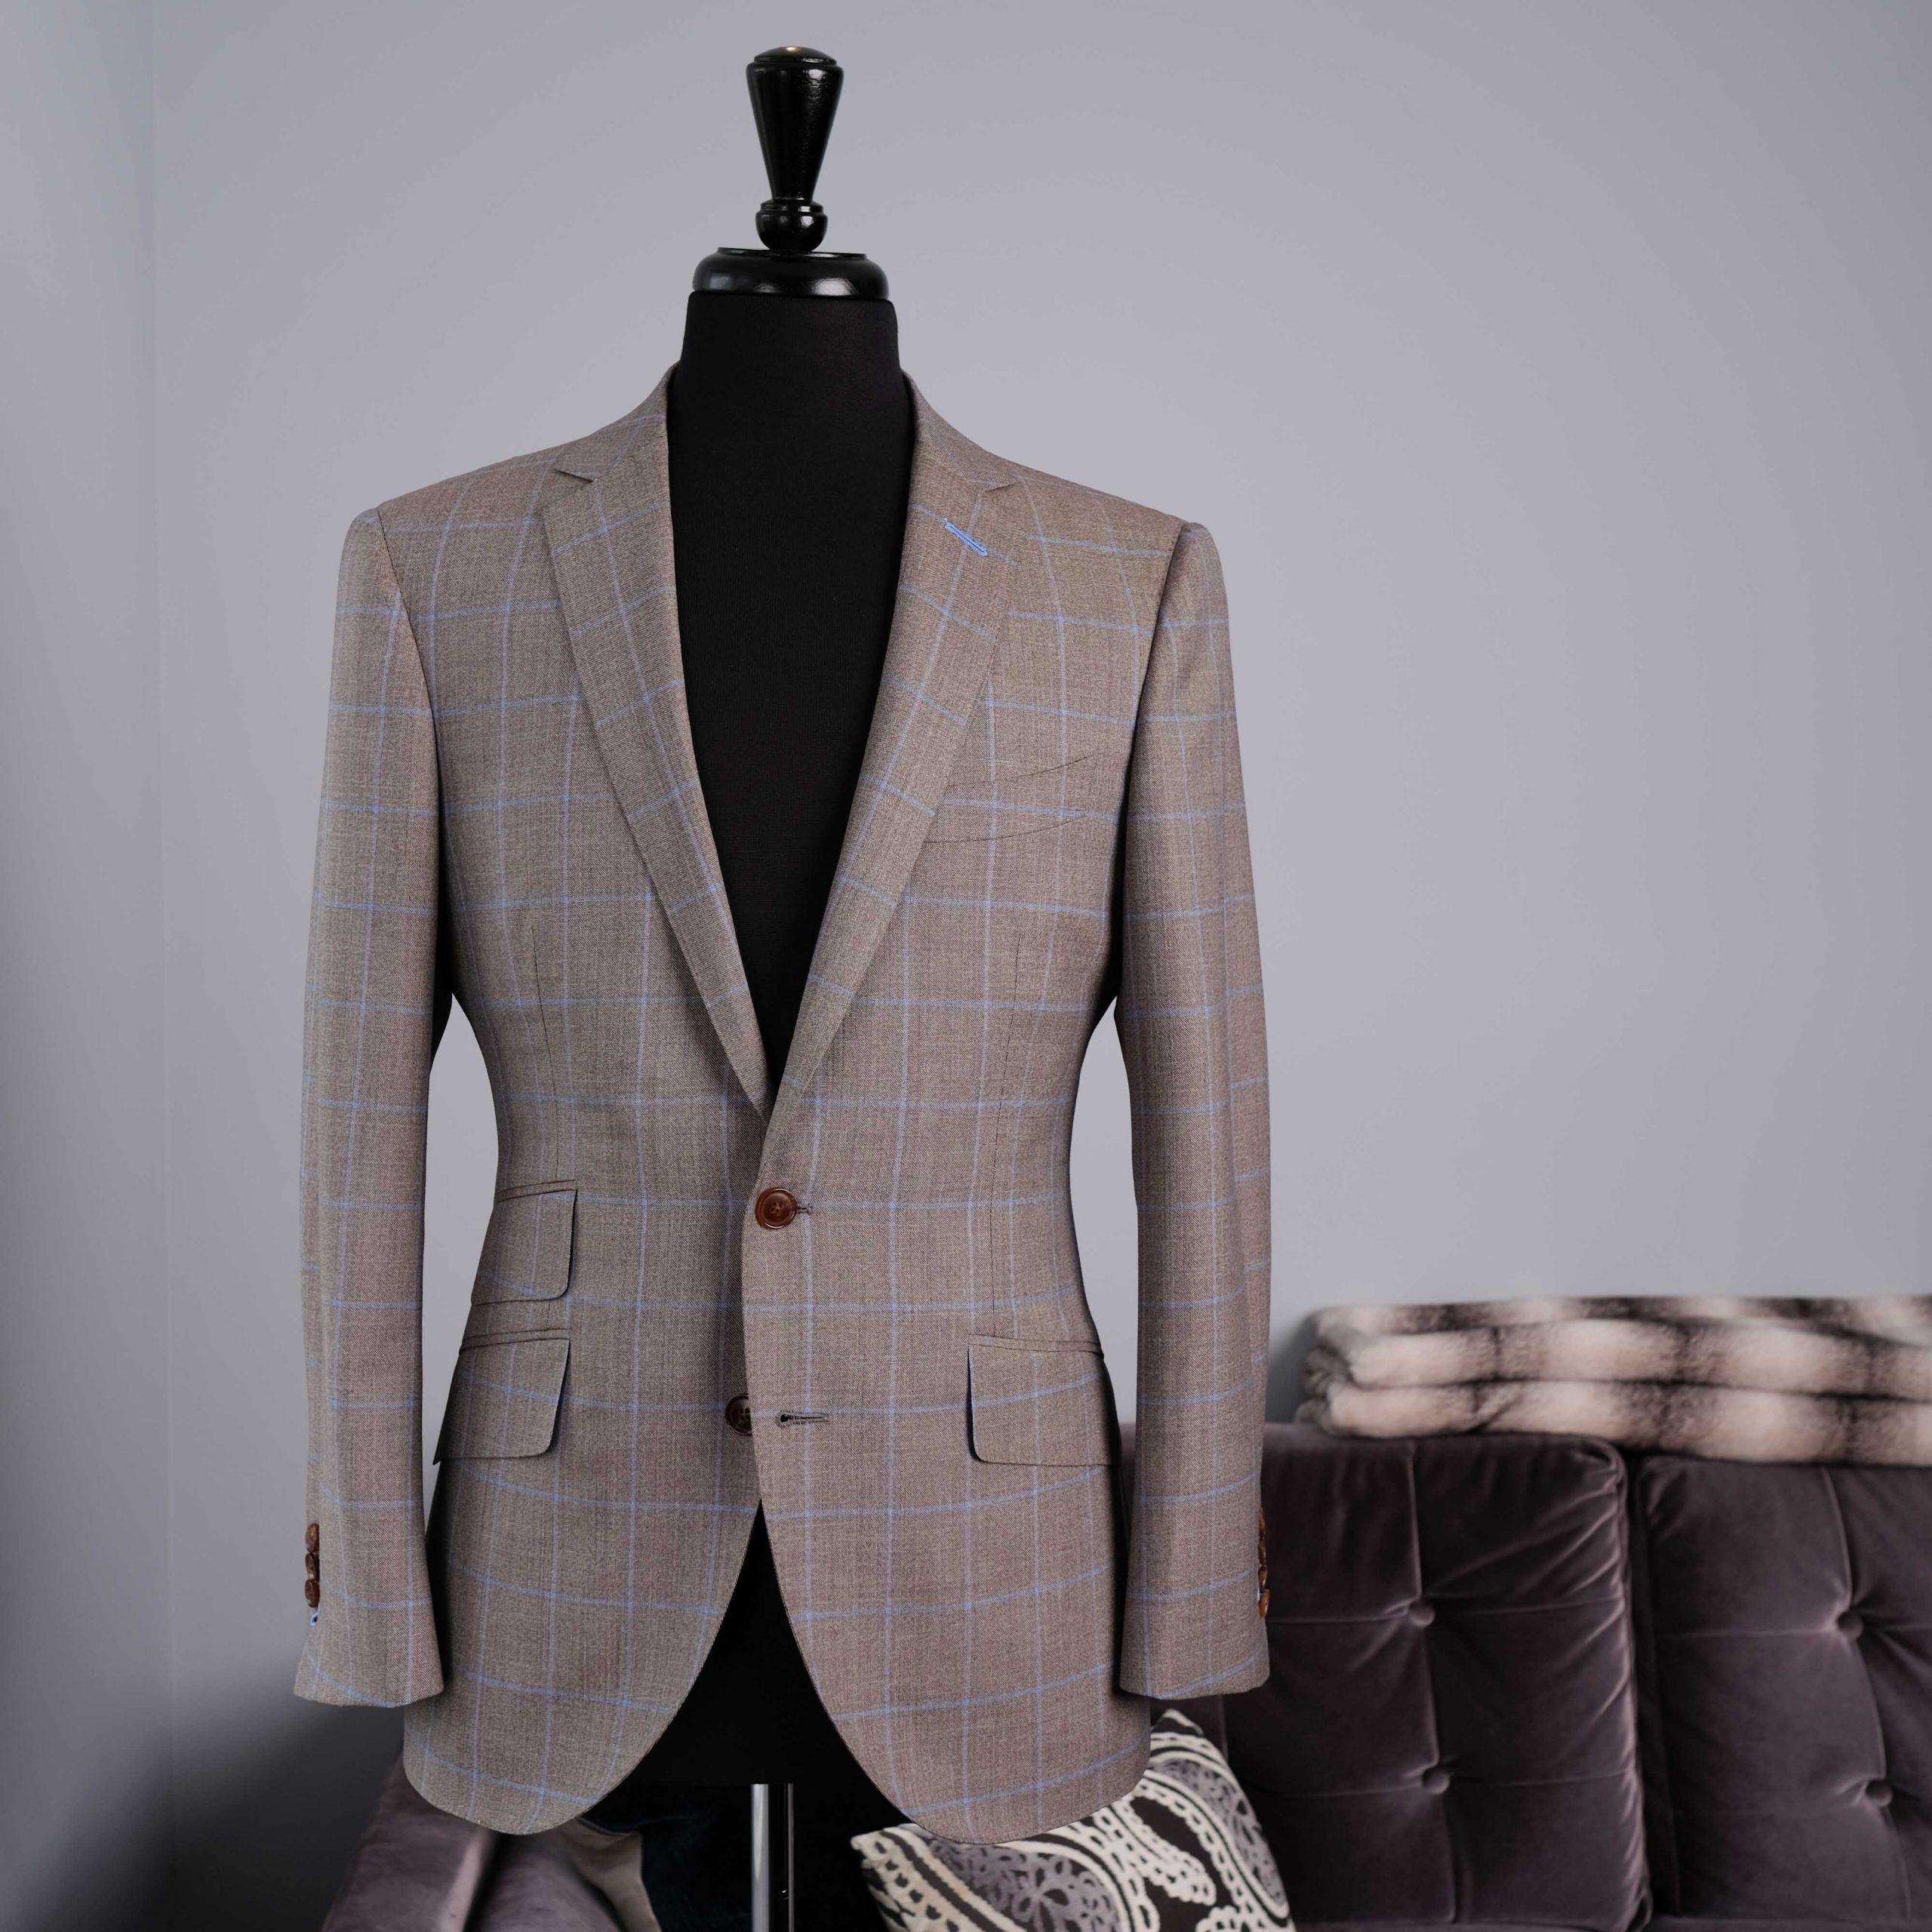 Brown Windowpane Bespoke Suit - Toronto